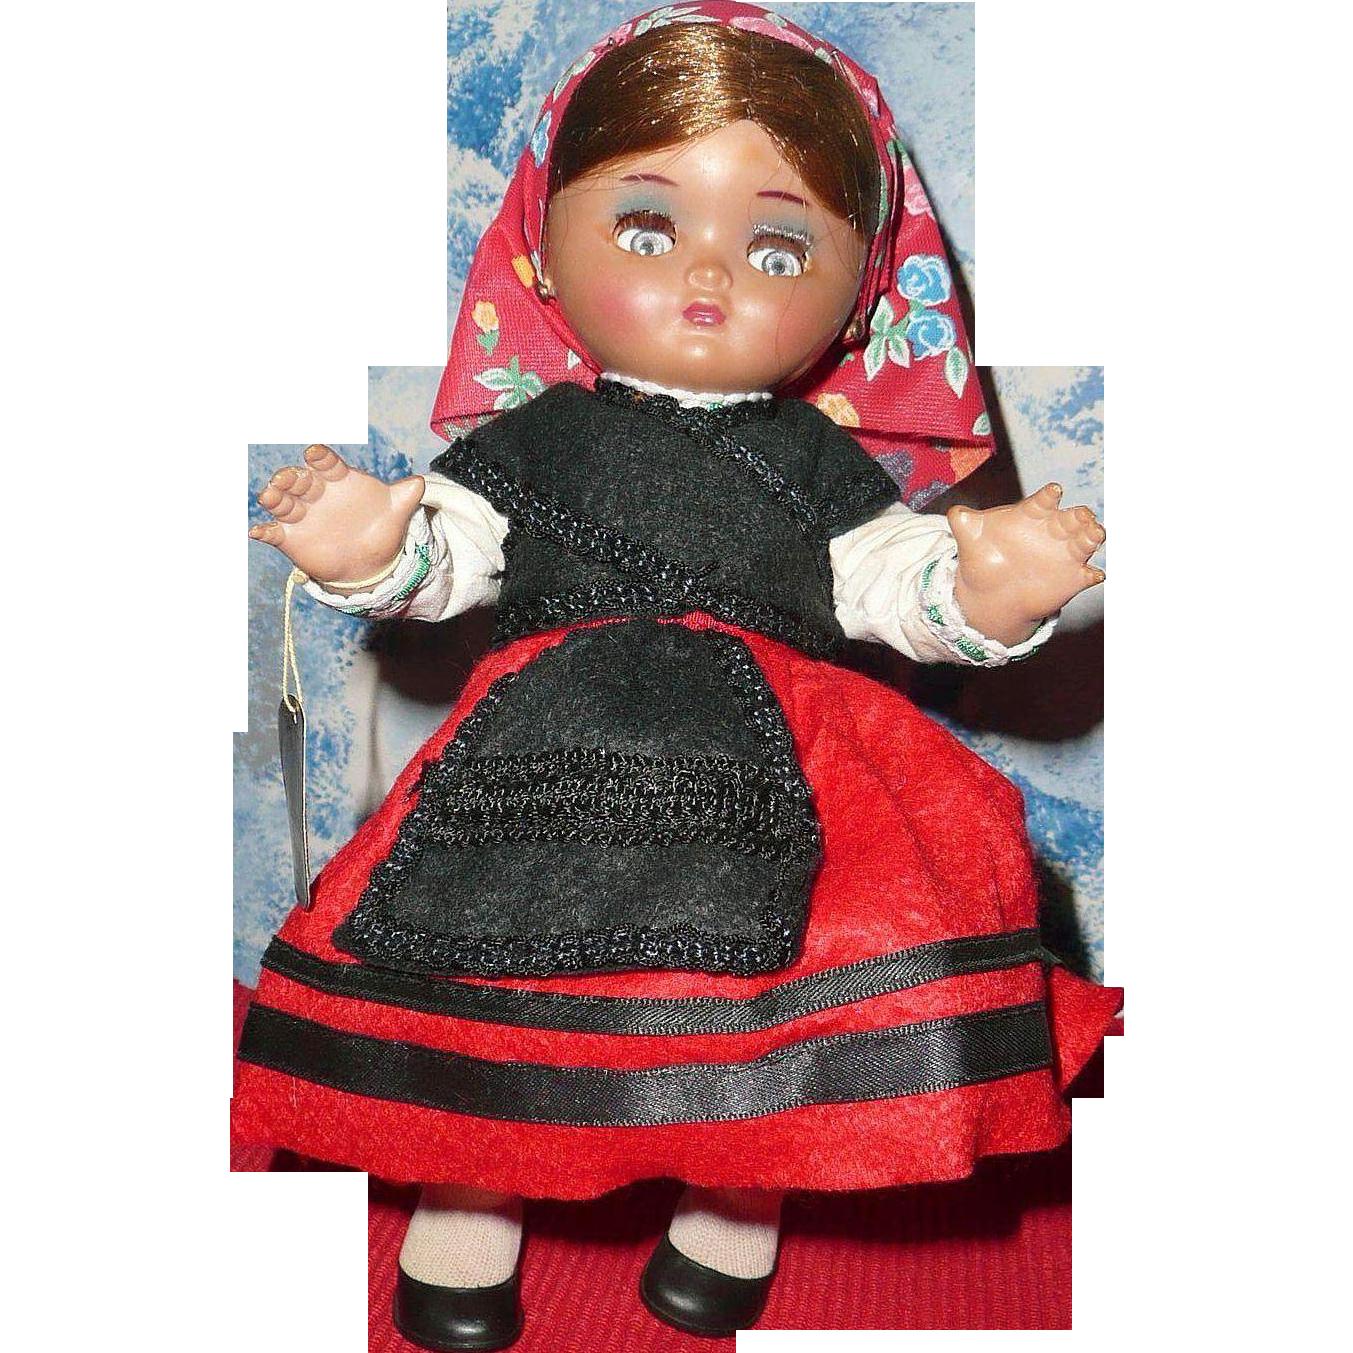 1950-1960 Muñecas de Alba PIRULA Spain *Galicia